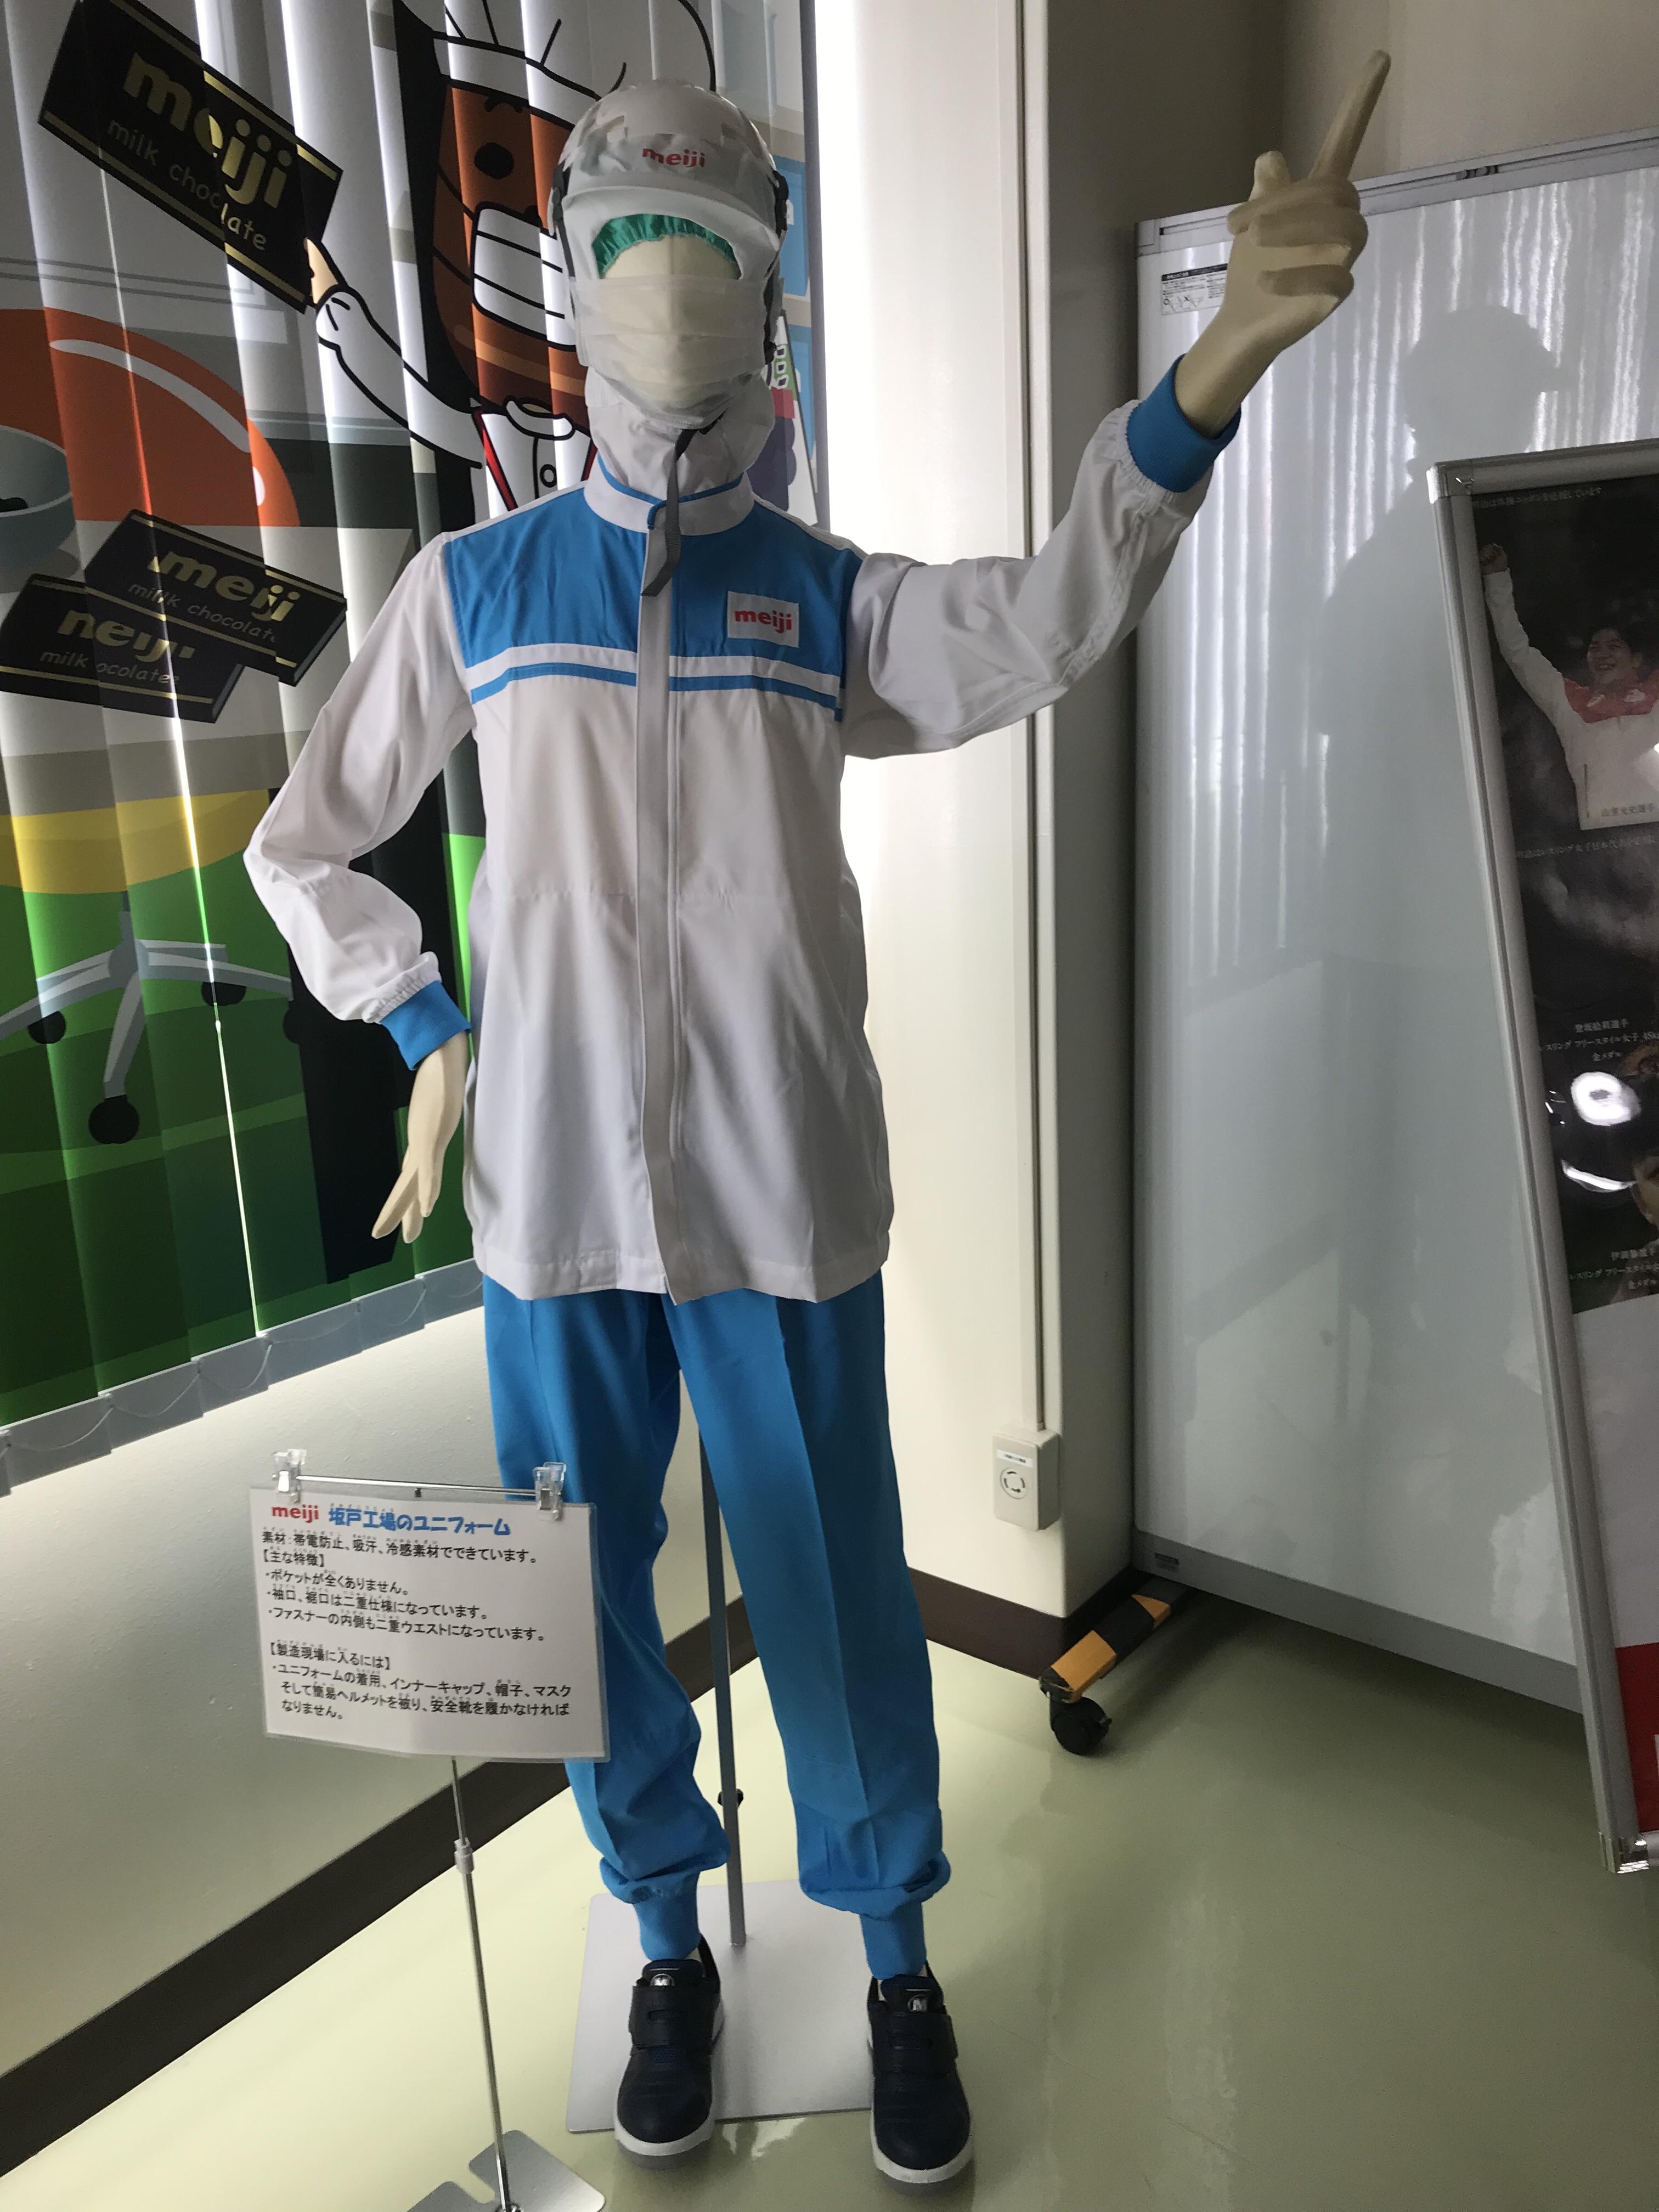 明治坂戸工場の作業服